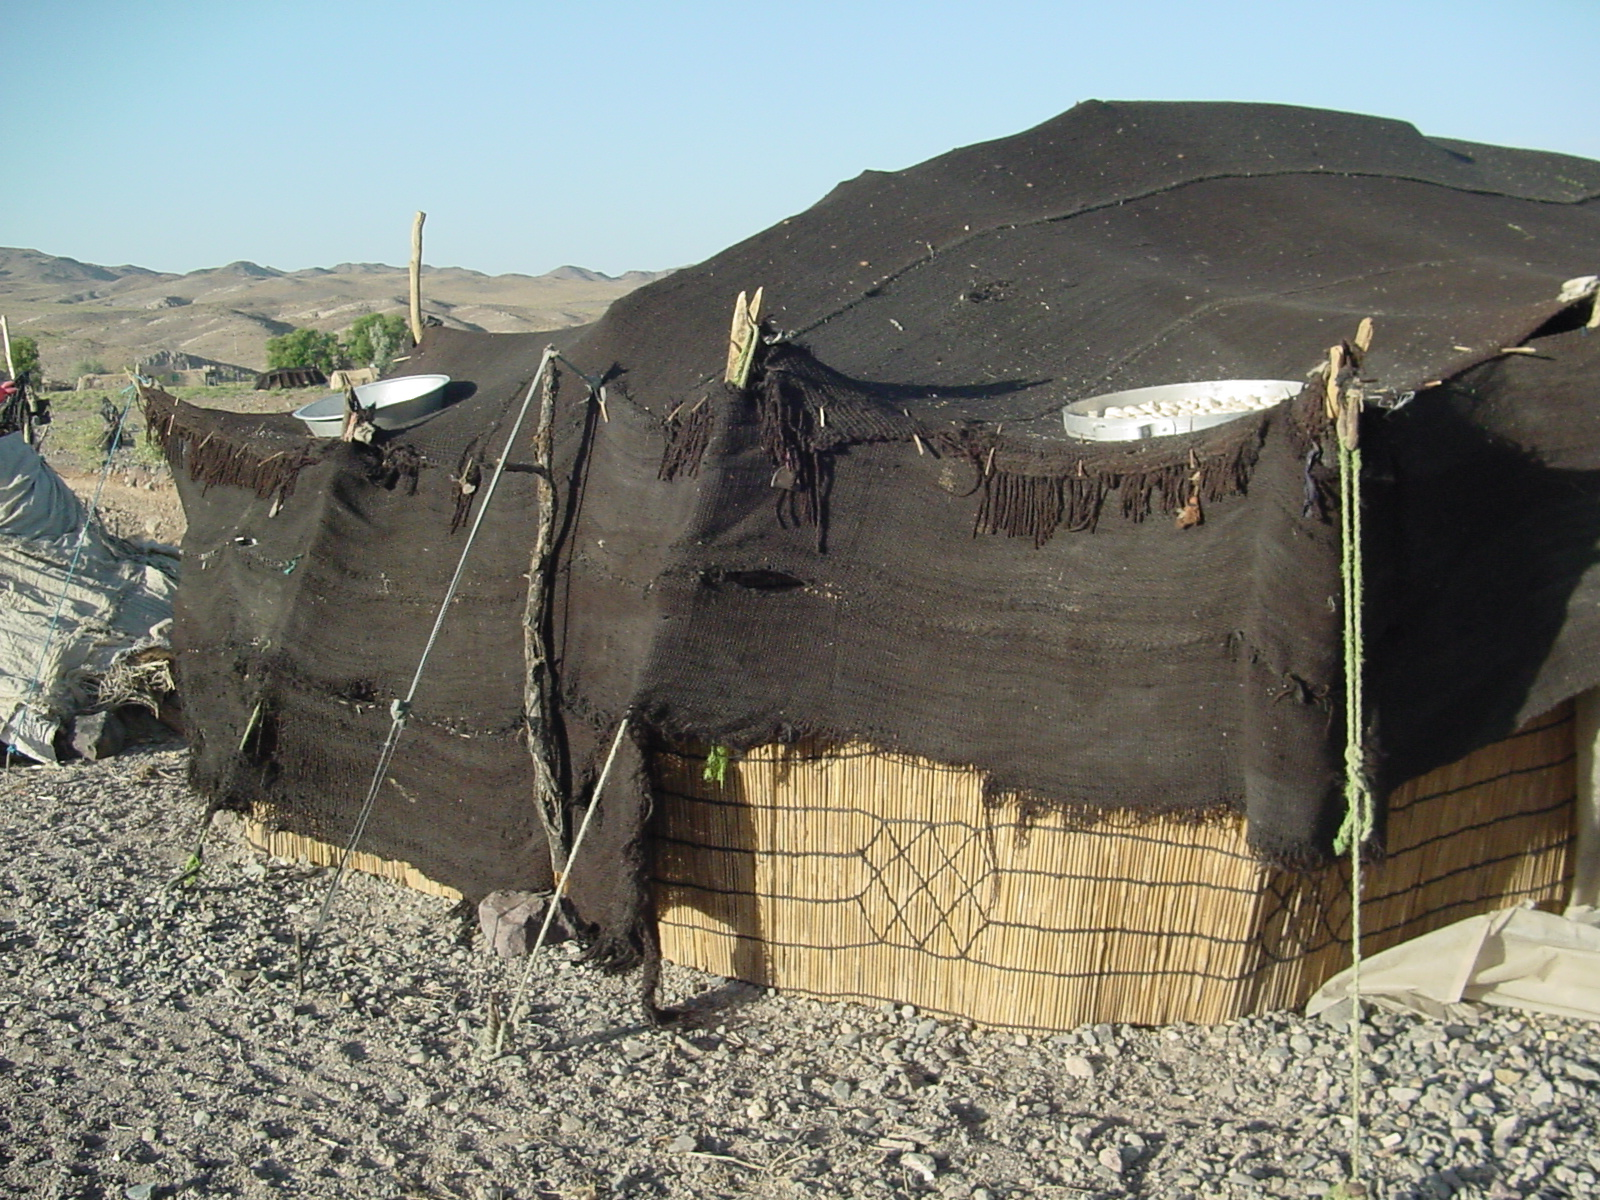 10x20 Ez Pop Up Gazebo Canopy Party Tent - Black - Prices, Reviews